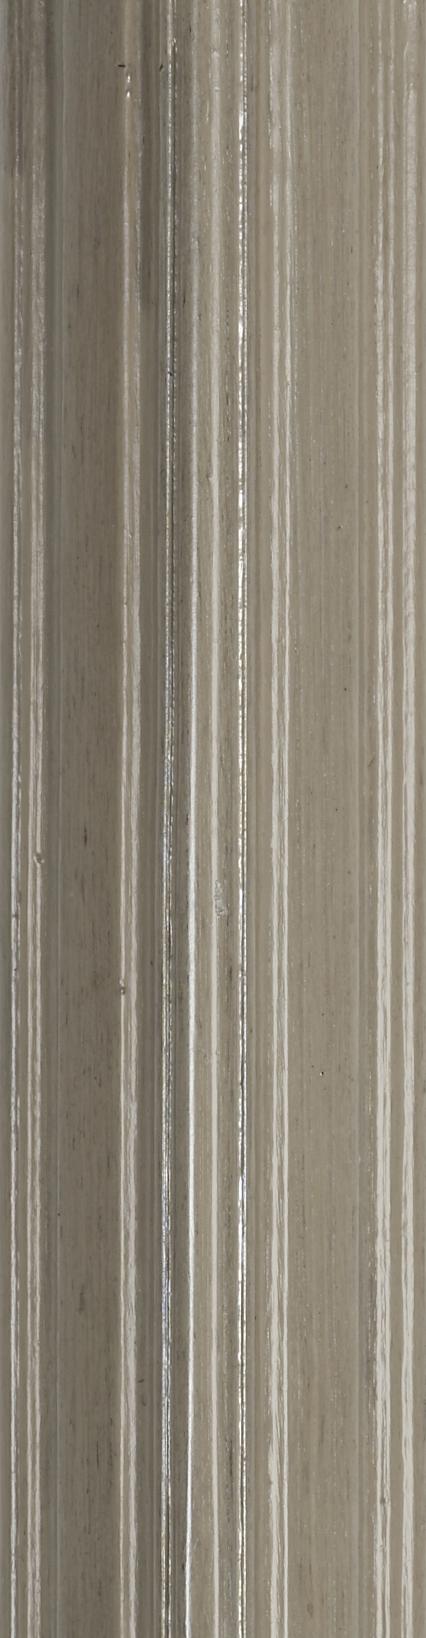 #38 Driftwood - PREMIUM Finish